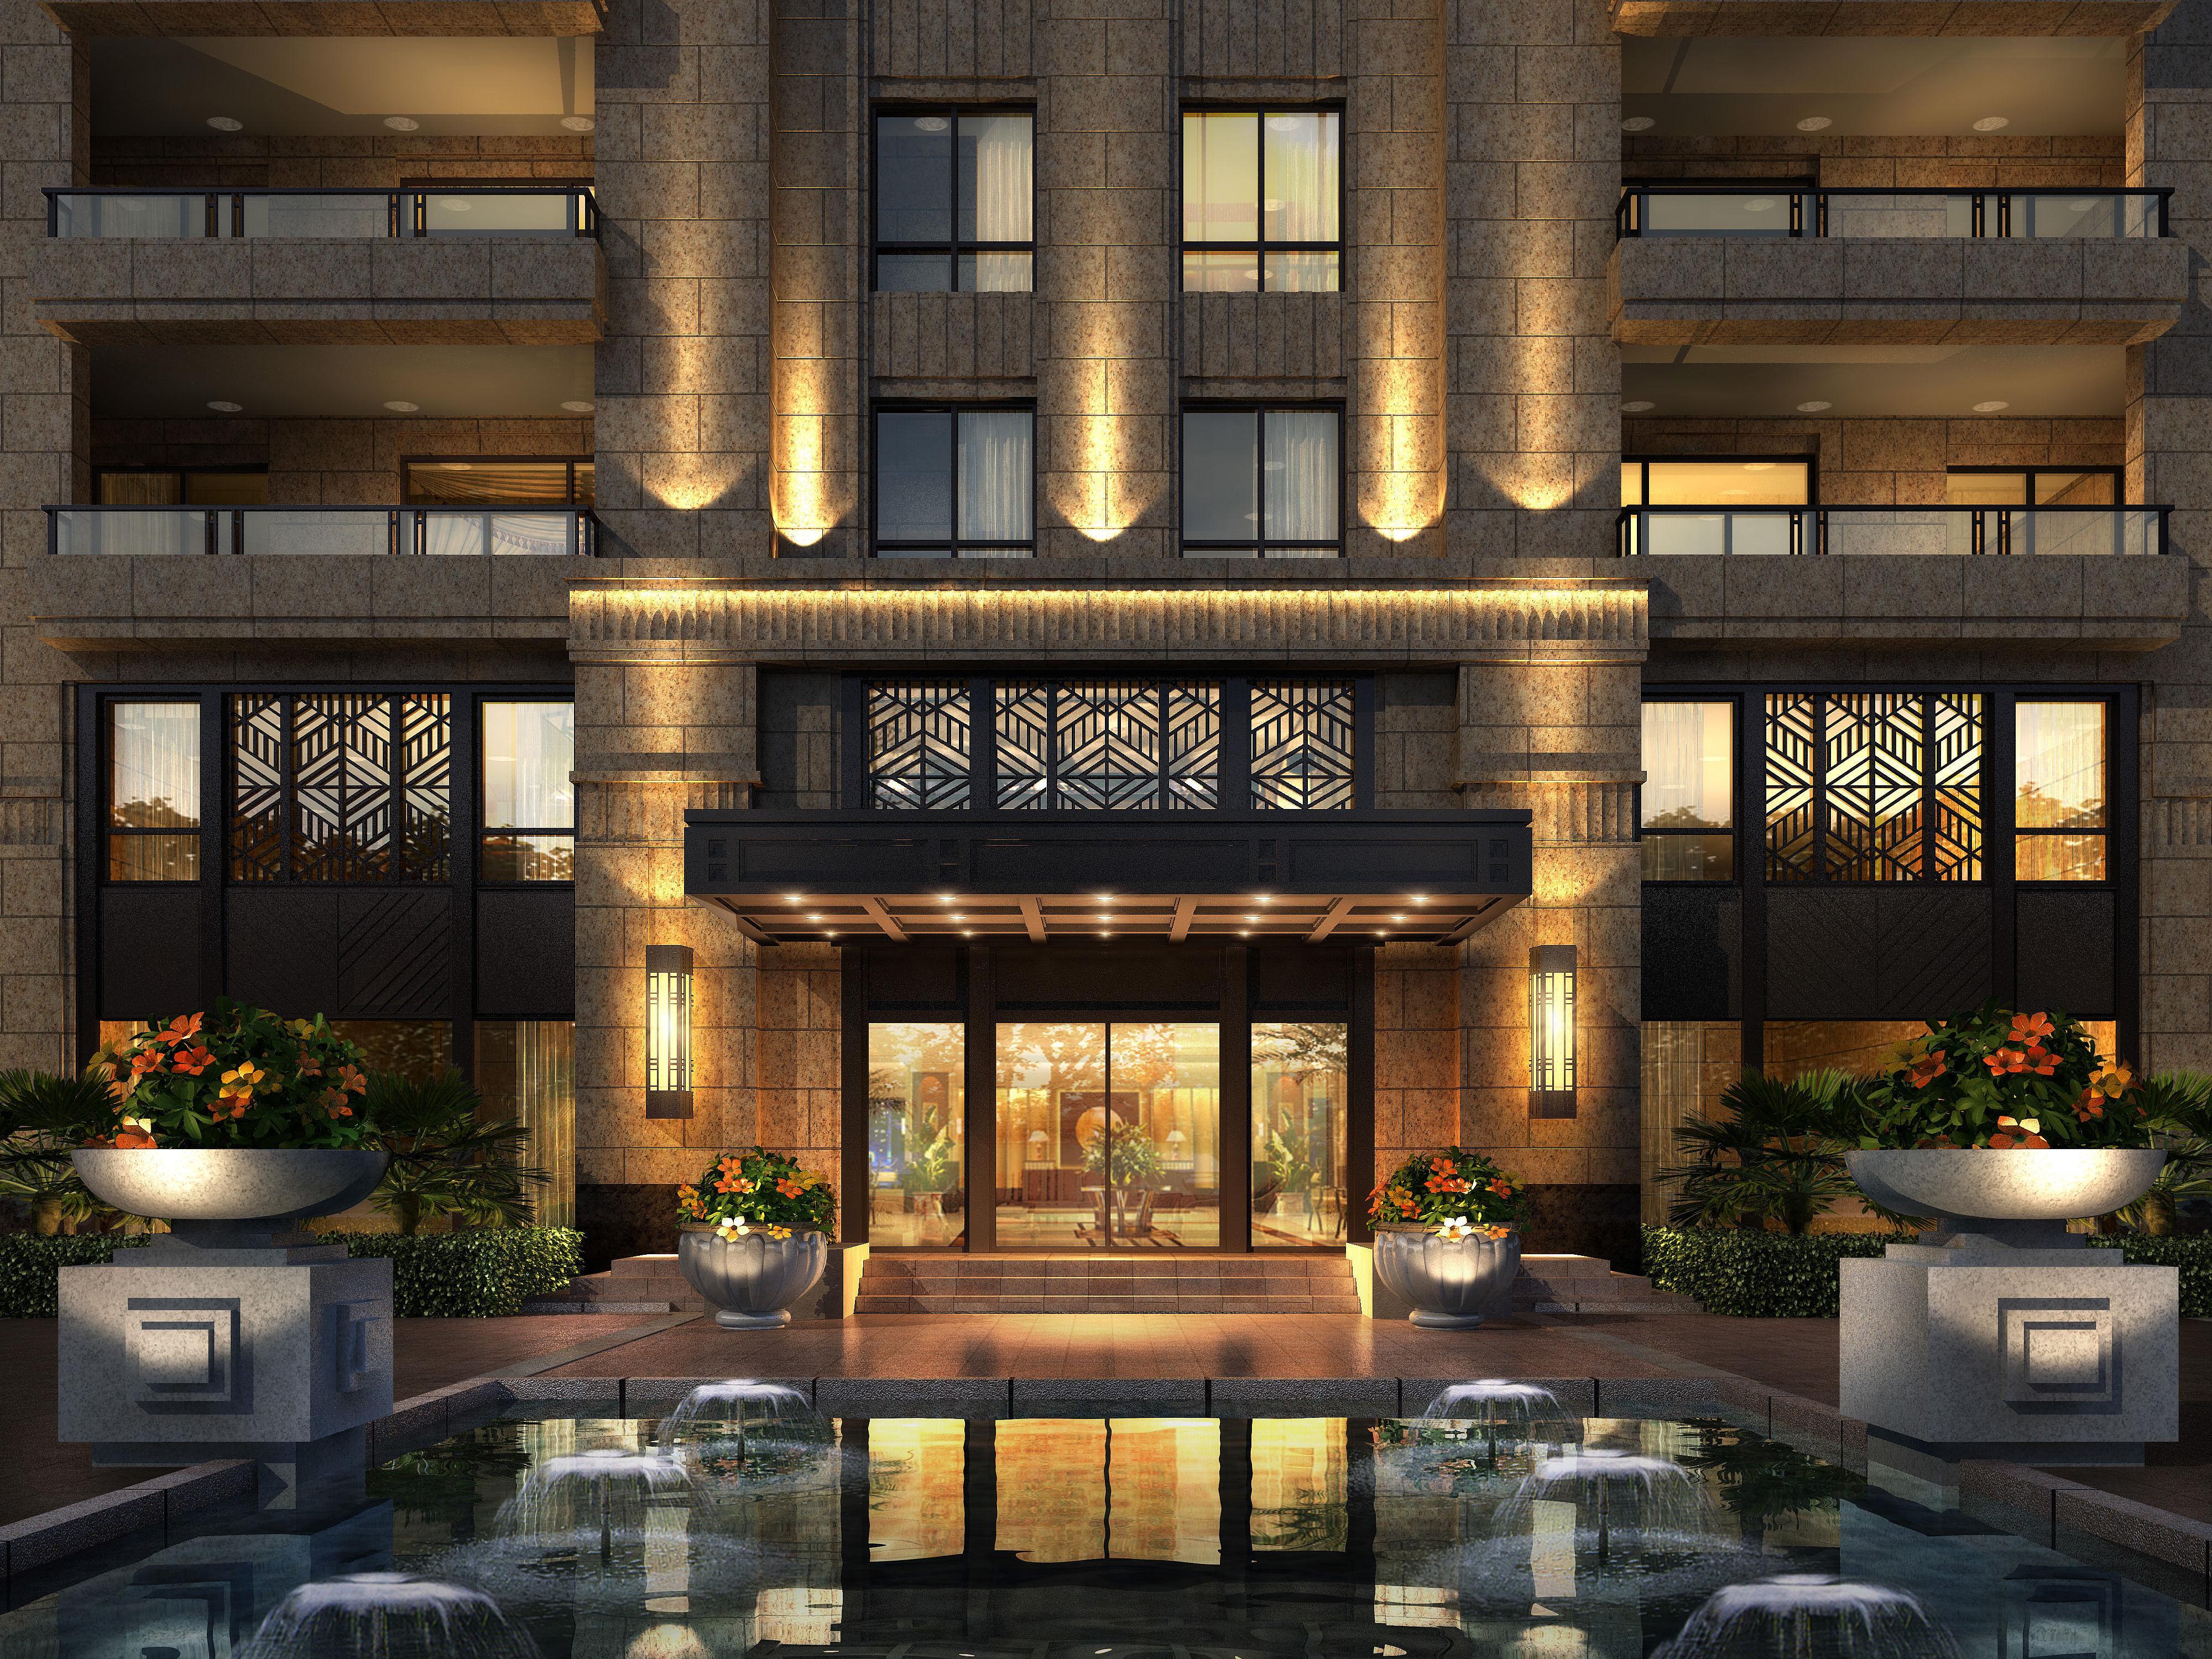 City luxury hotel villa design office 11 3d model max for City hotel design